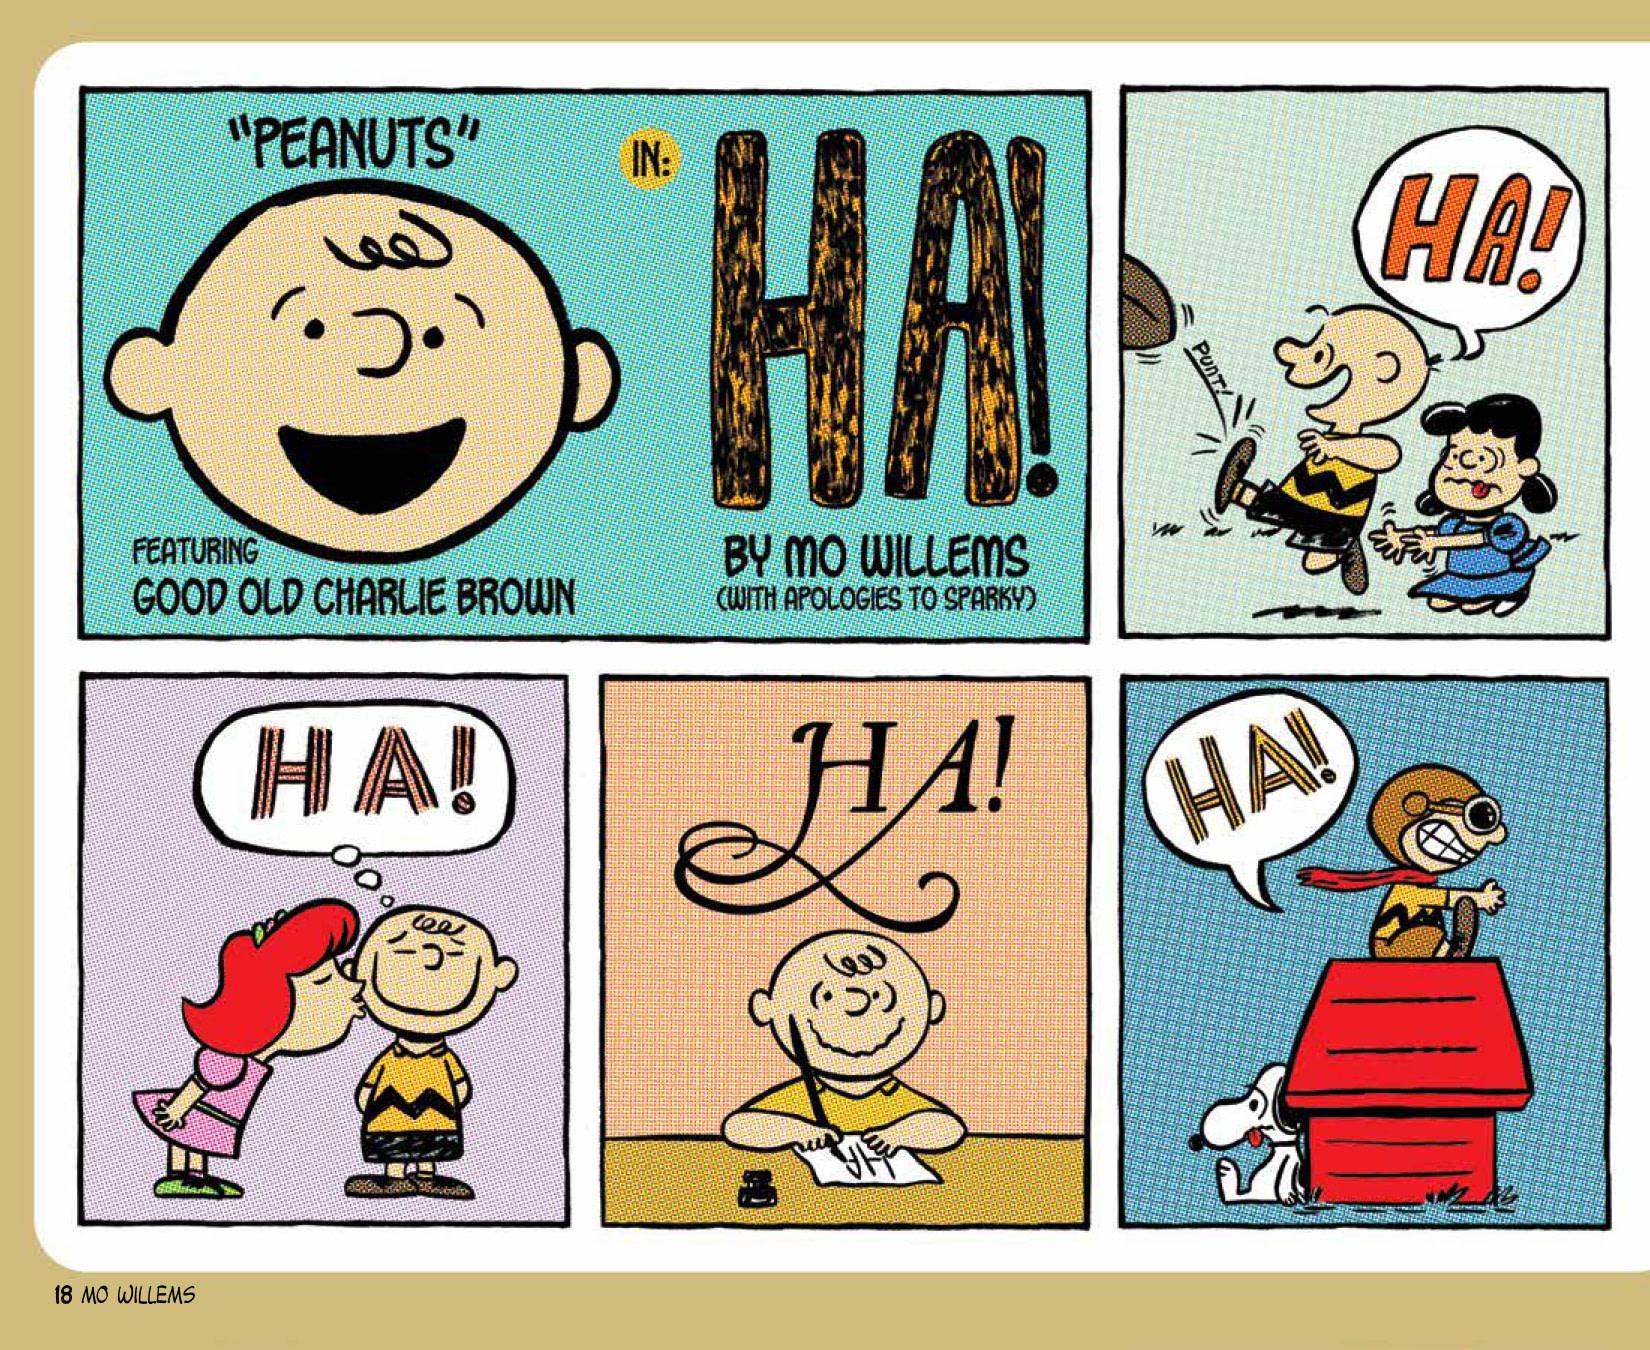 Peanuts_TributeCharlesSchulz_HC_PRESS-22